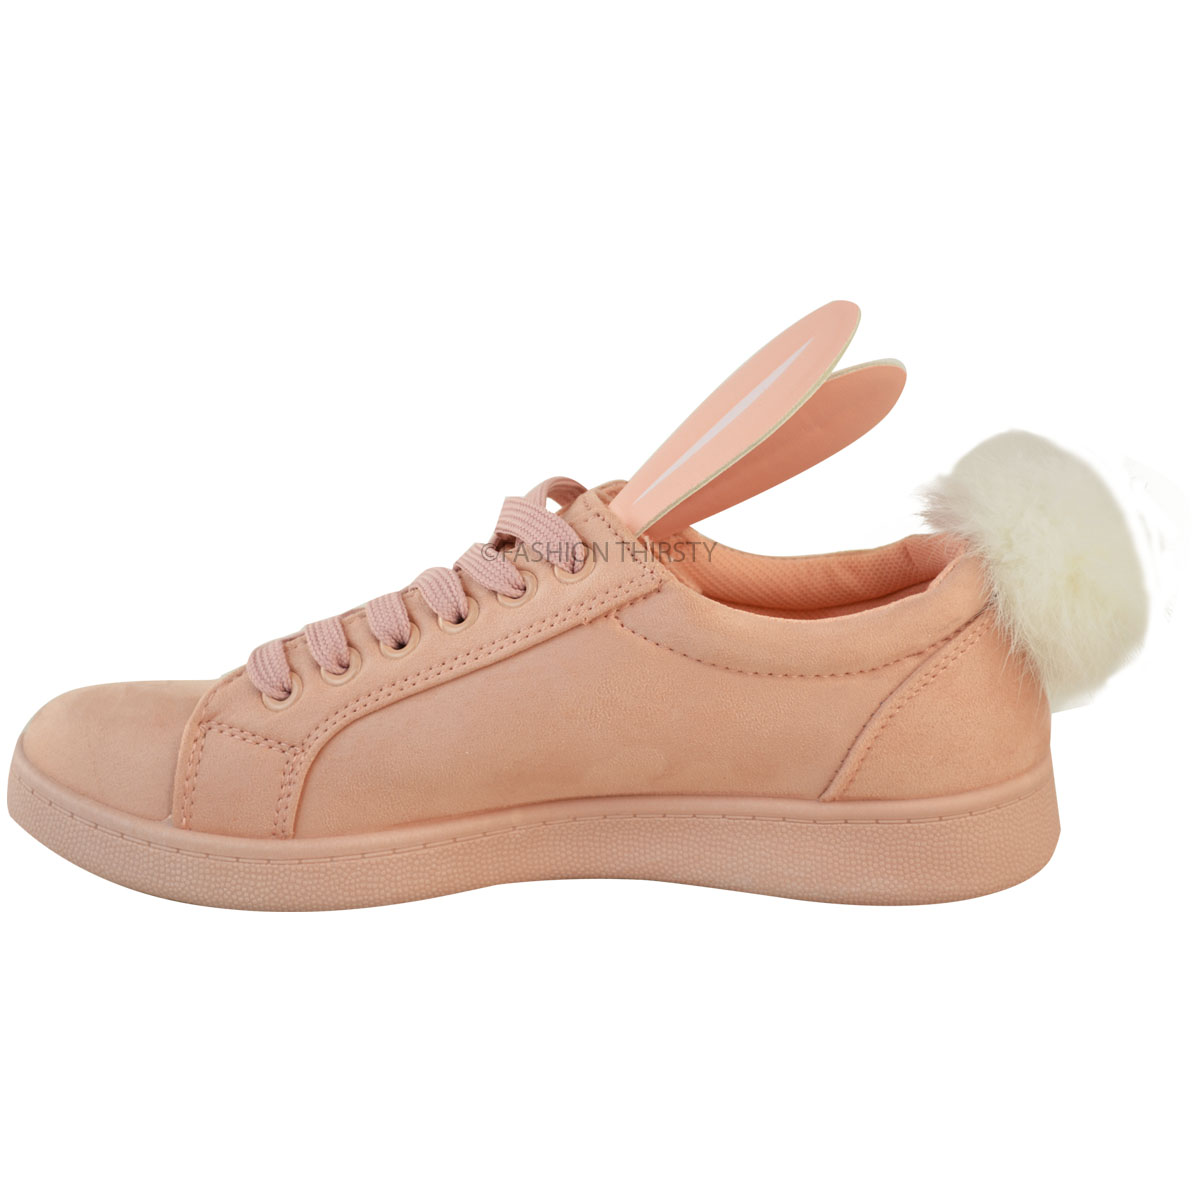 Ladies Bunny Flat Shoes